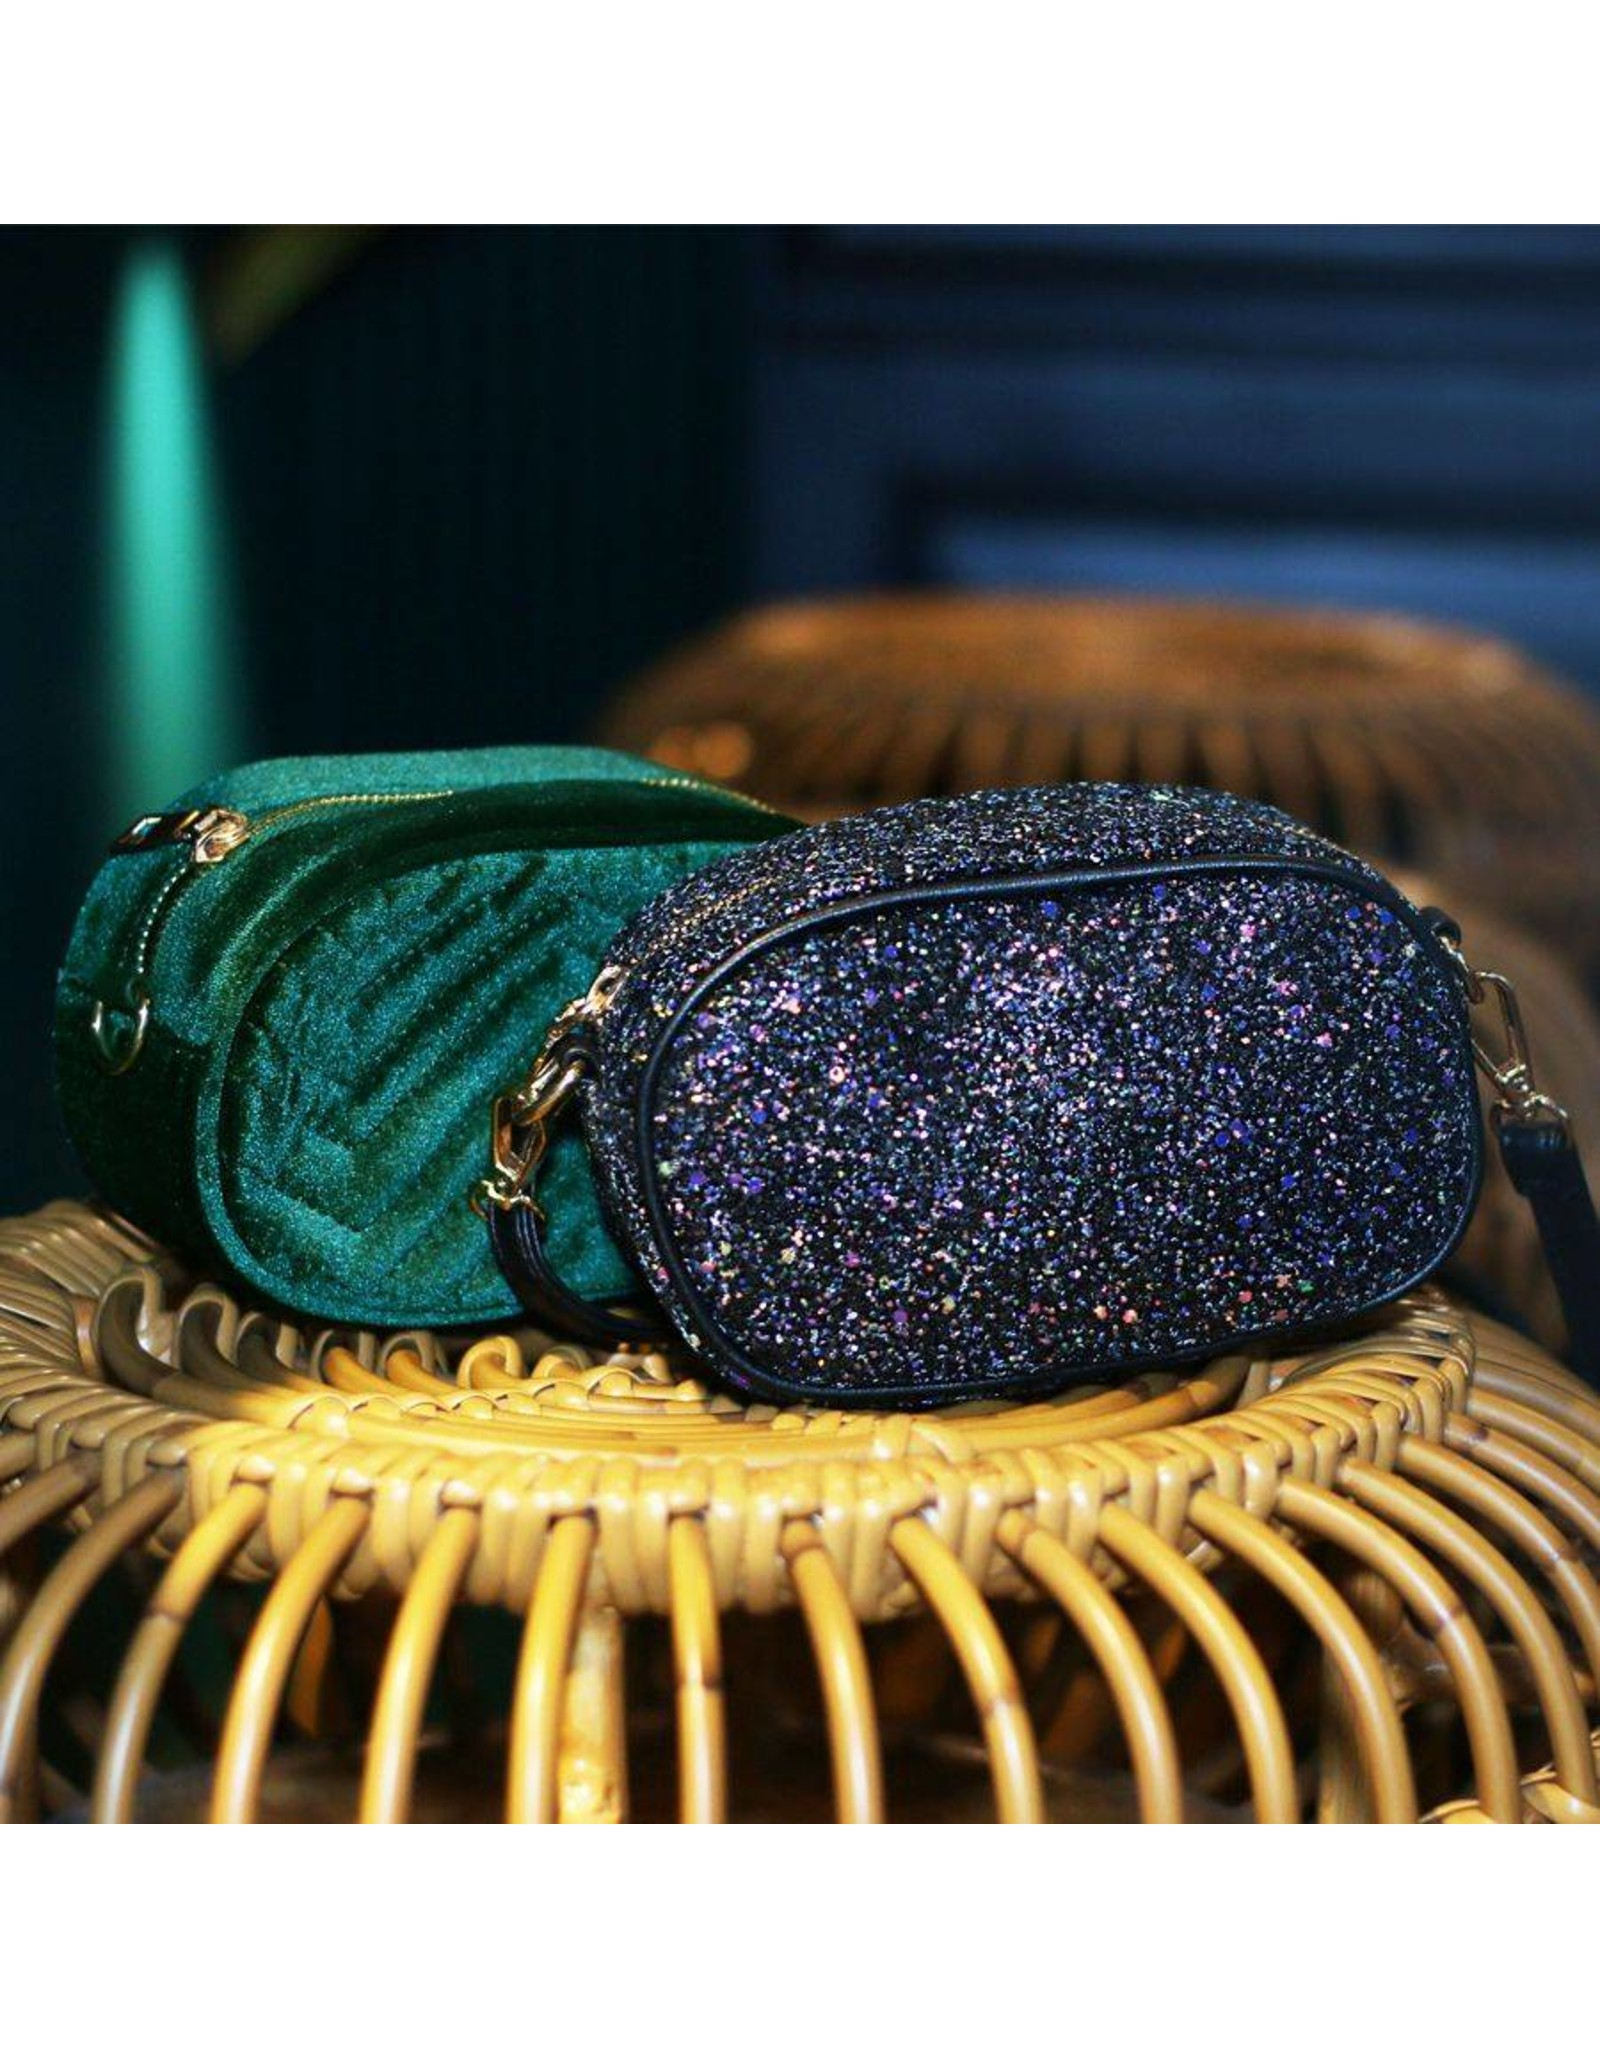 My Jewellery The Green Bumbag